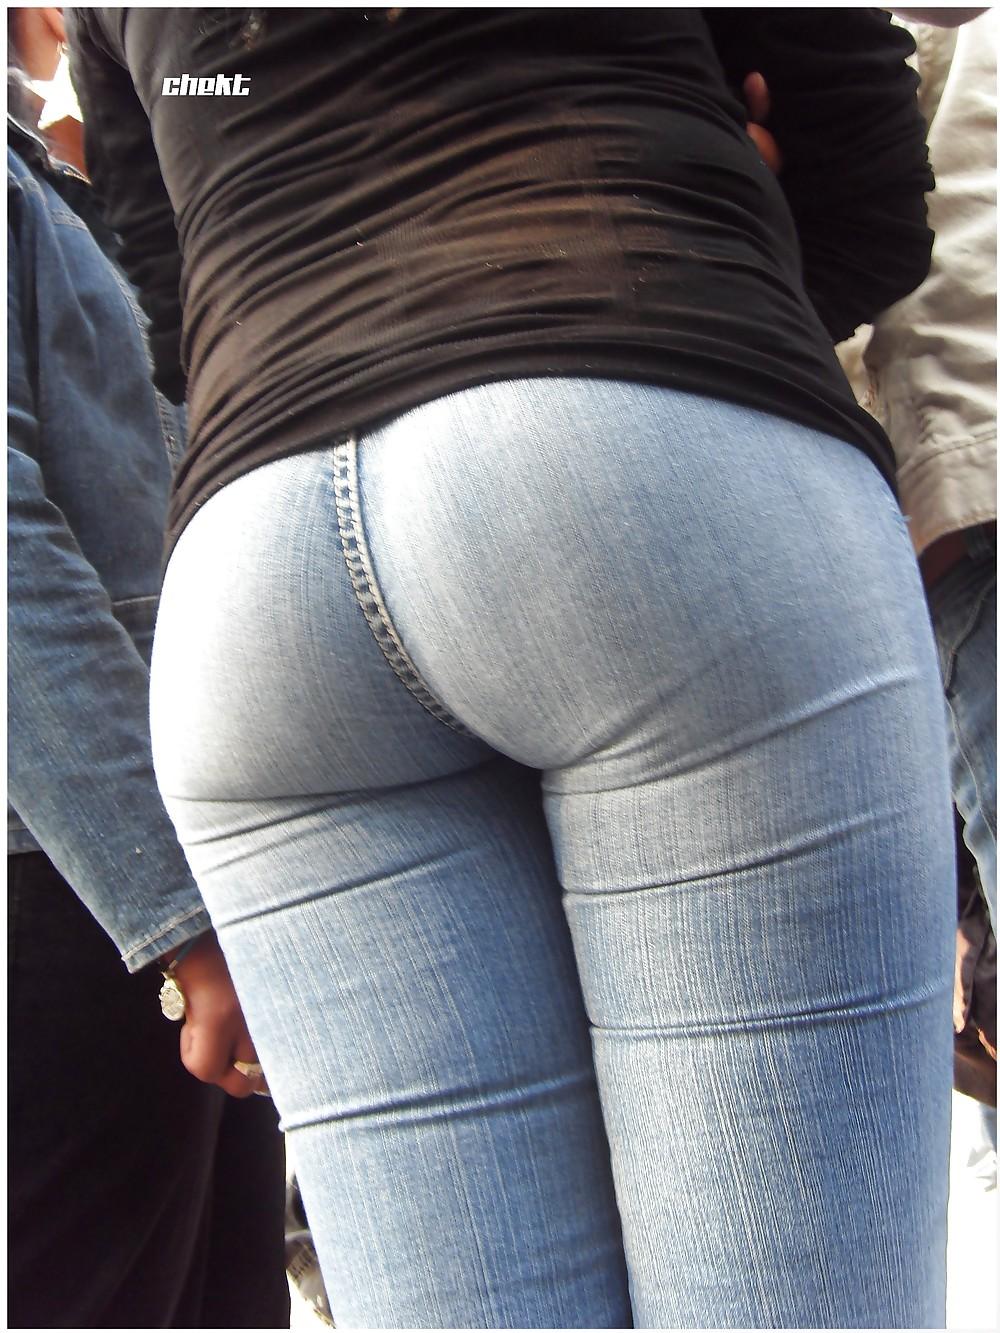 Playing strip free tight jeans voyeur pics fucking pussy army